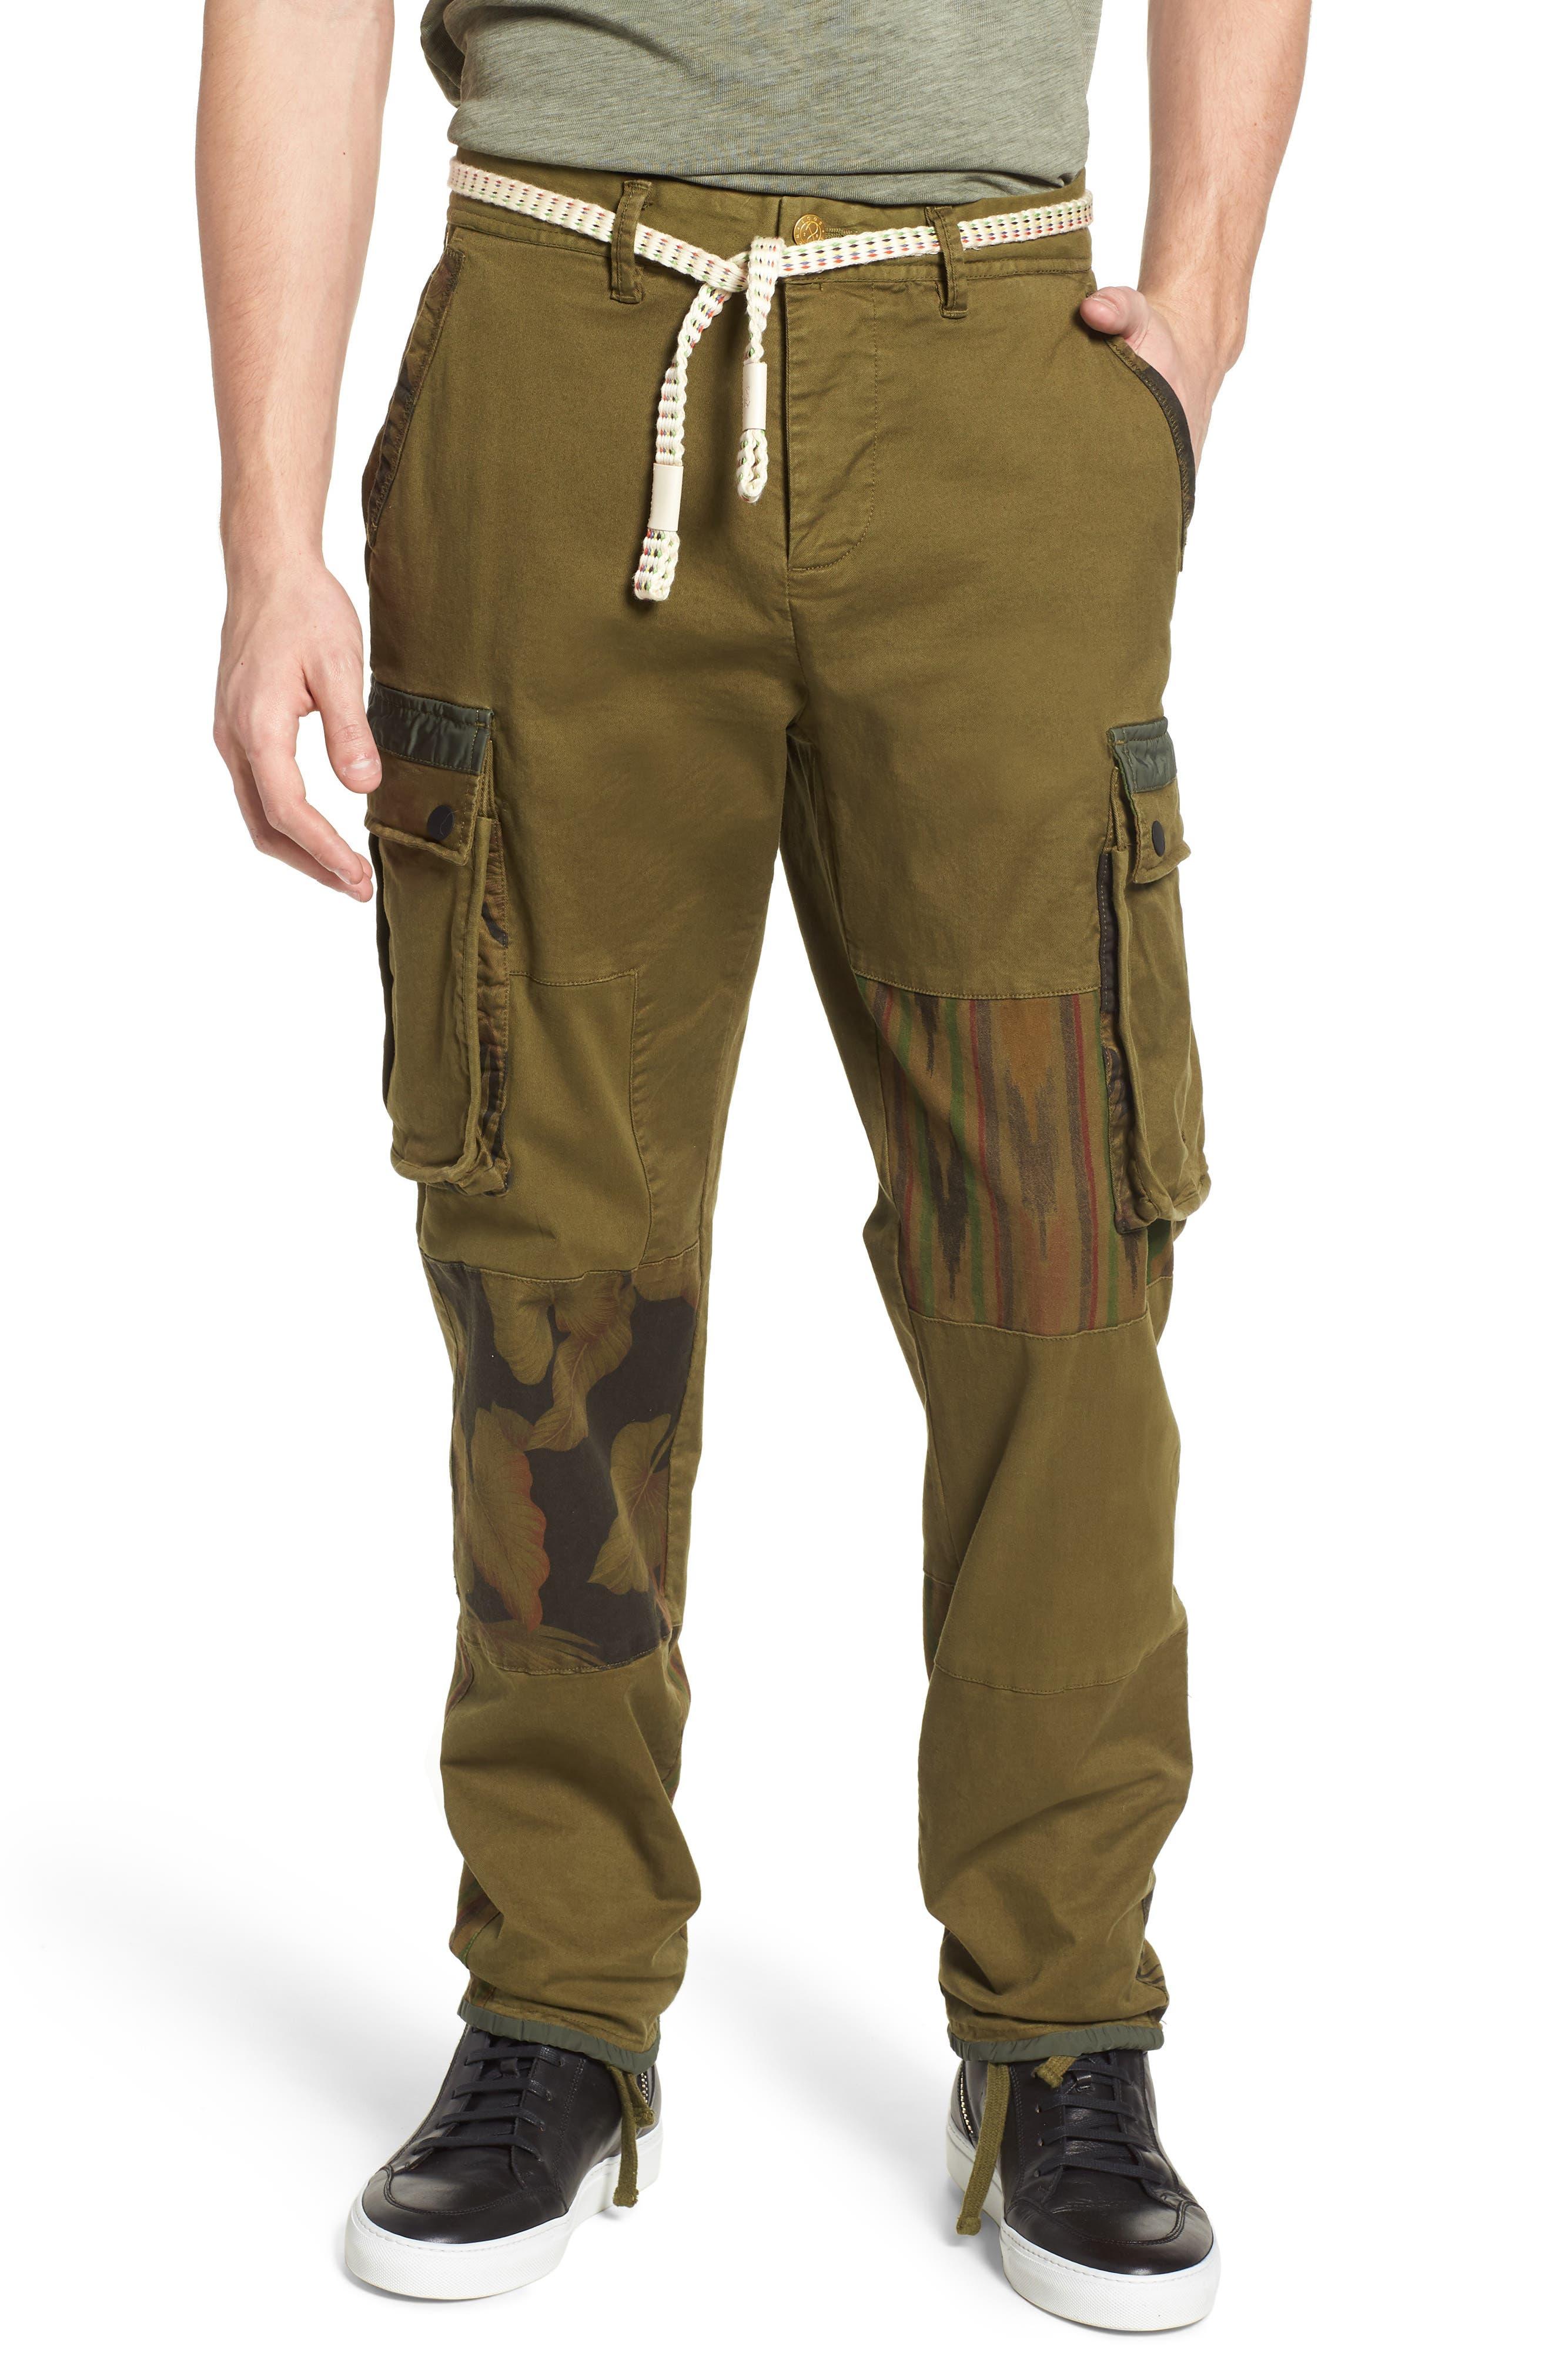 Alternate Image 1 Selected - Scotch & Soda Utility Pants